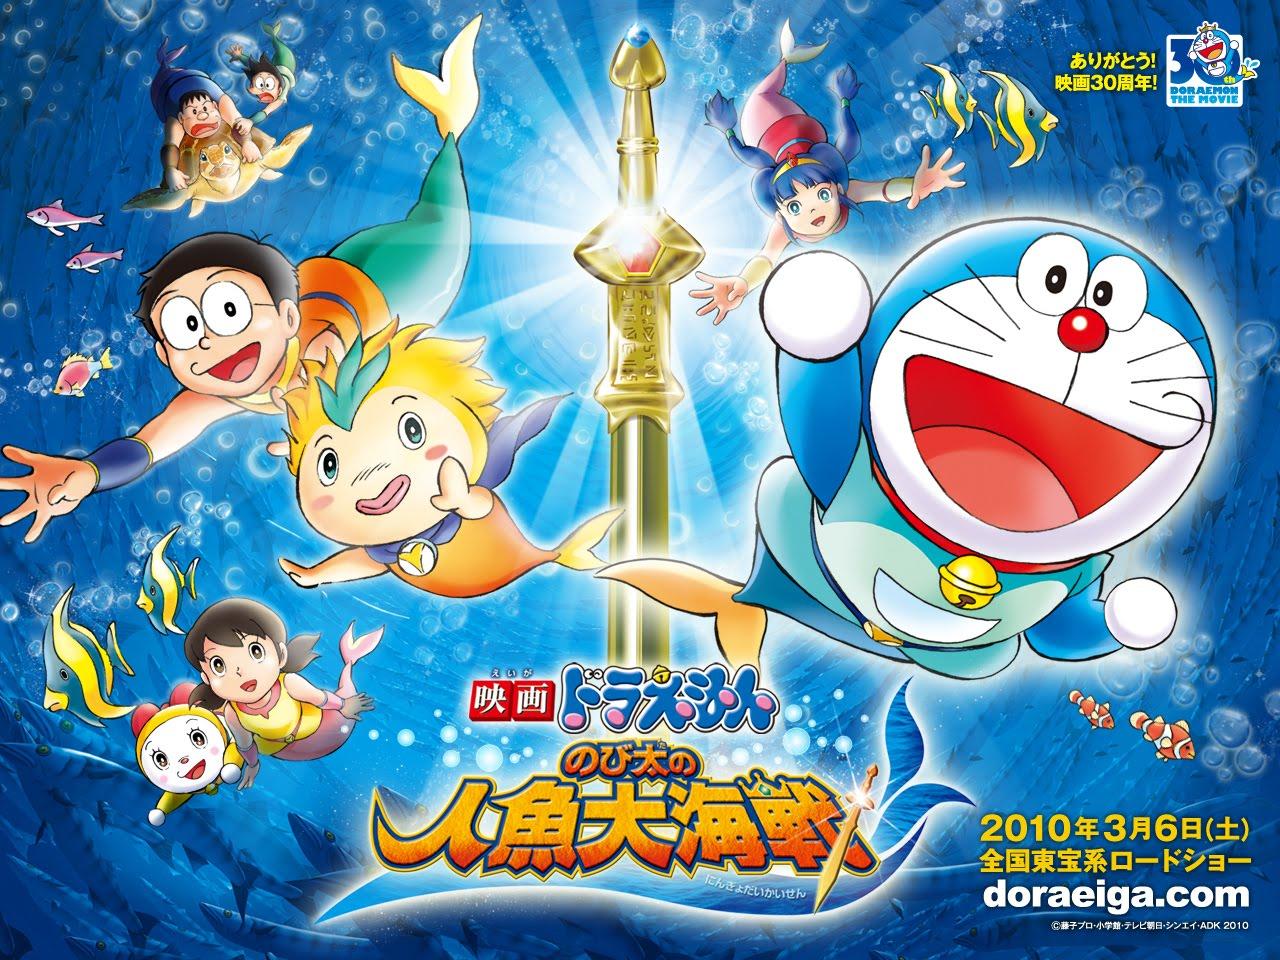 Doraemon. Doraemon, Romantis, Lucu